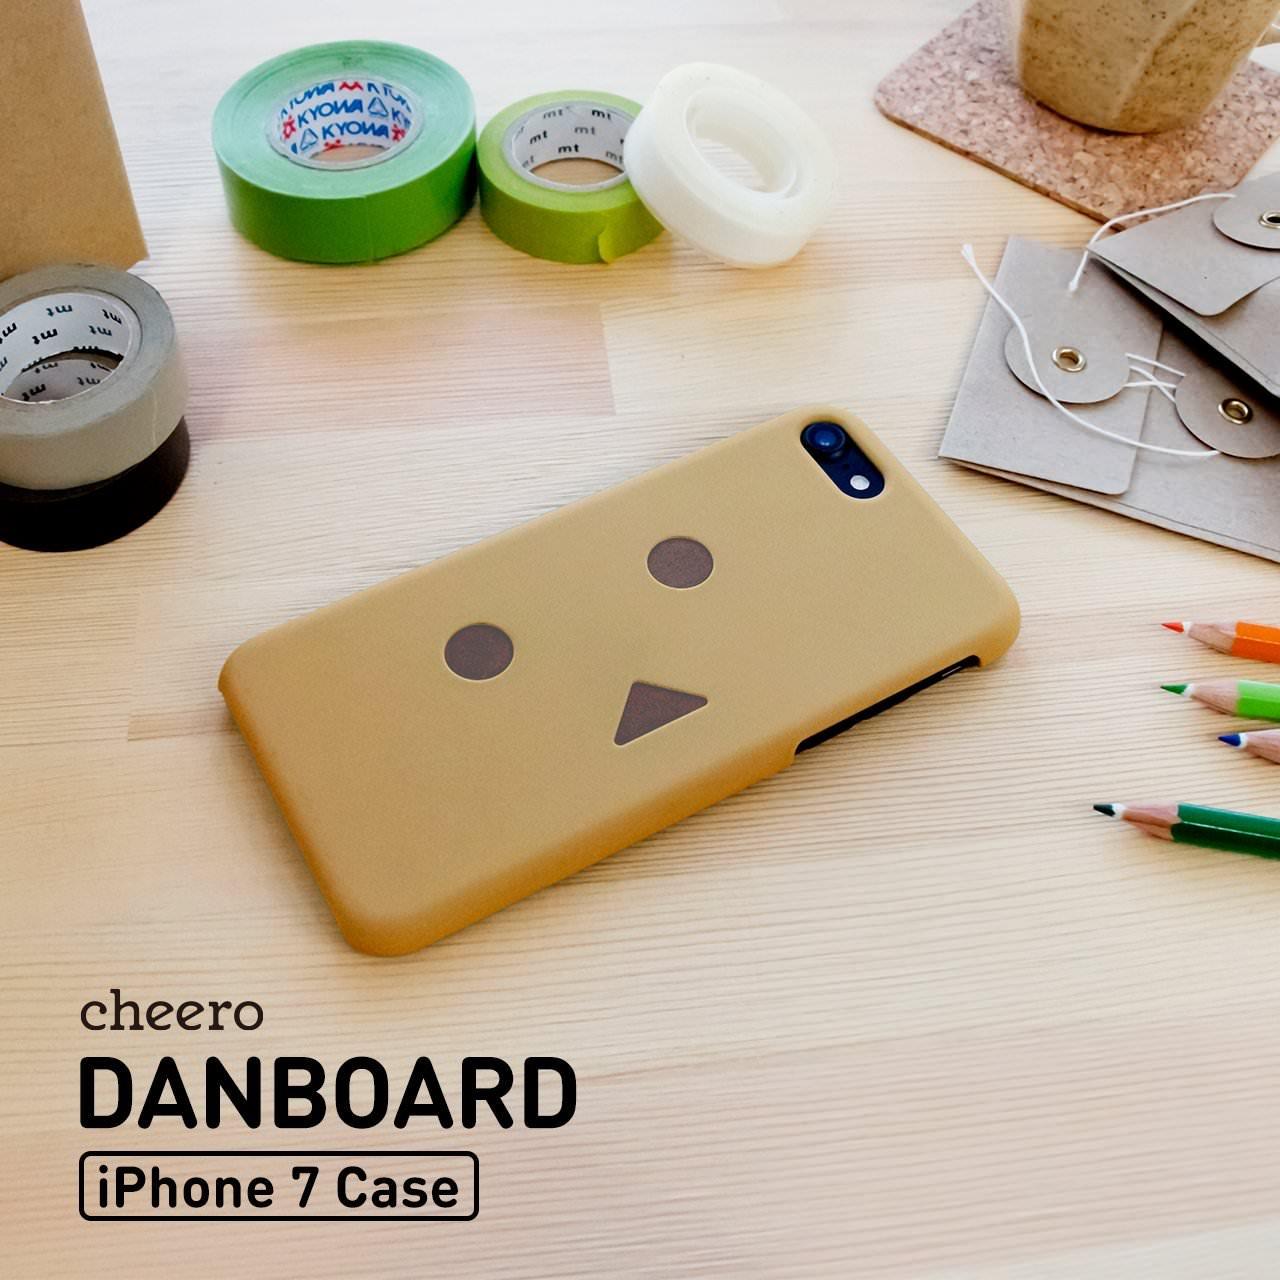 cheero-danboard-caseforiphone73